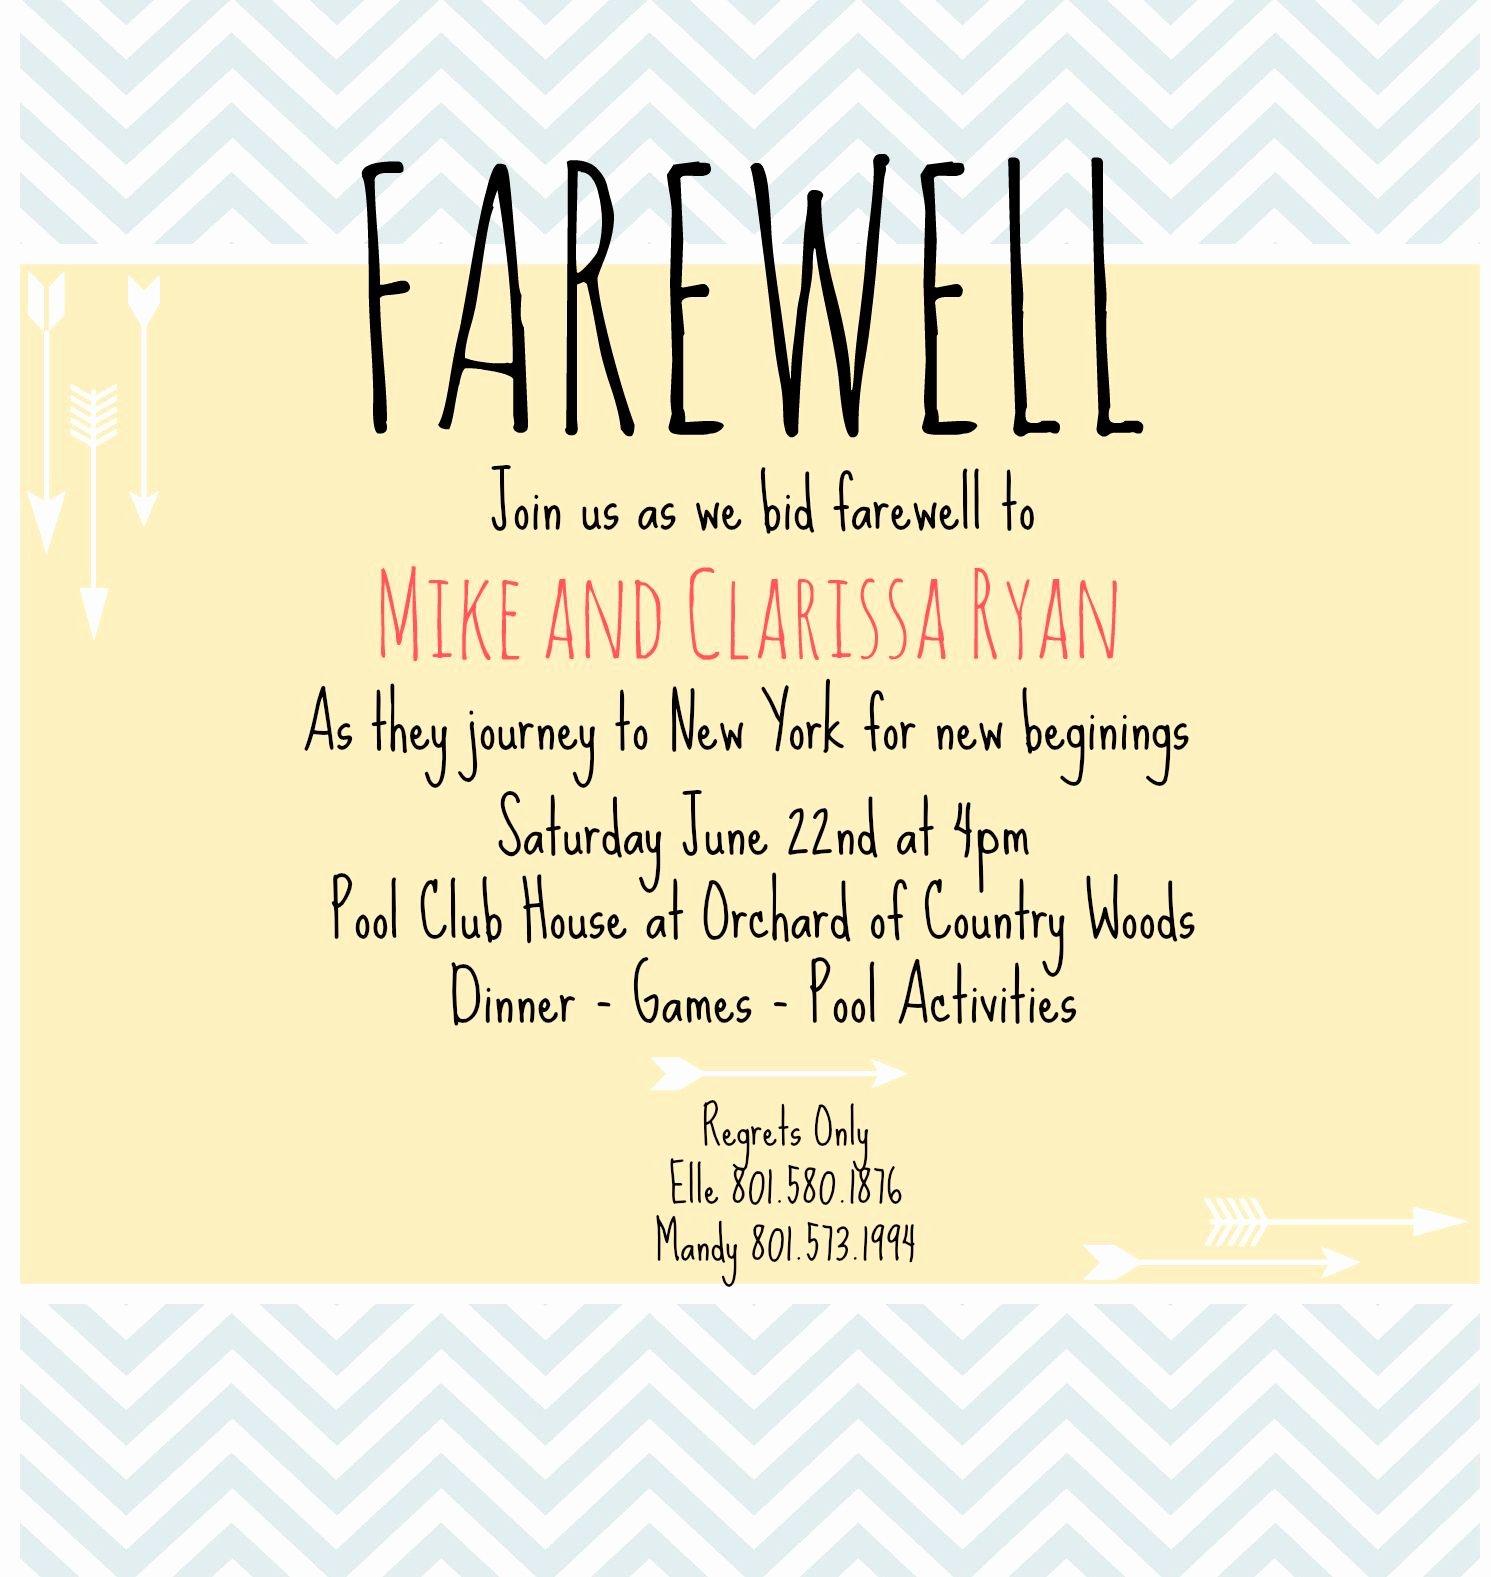 Farewell Party Invitation Wording Inspirational Farewell Invite Picmonkey Creations